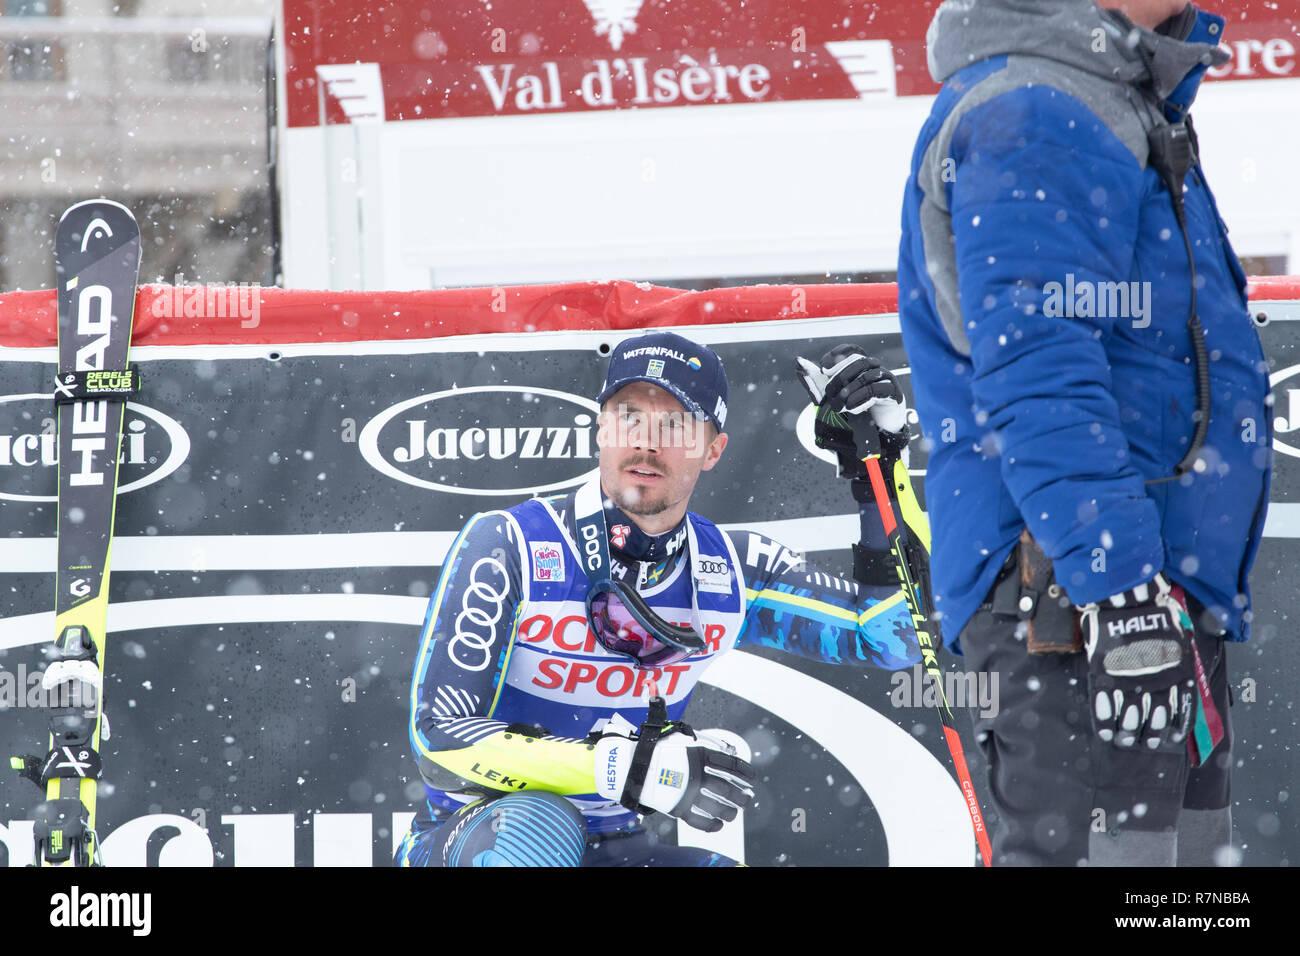 08 Dec 2018 Podium presentation Matts Olsson of Sweden 3rd in  Val d'Isere men's Giant Slalom Audi FIS Alpine Ski World Cup 2019 - Stock Image